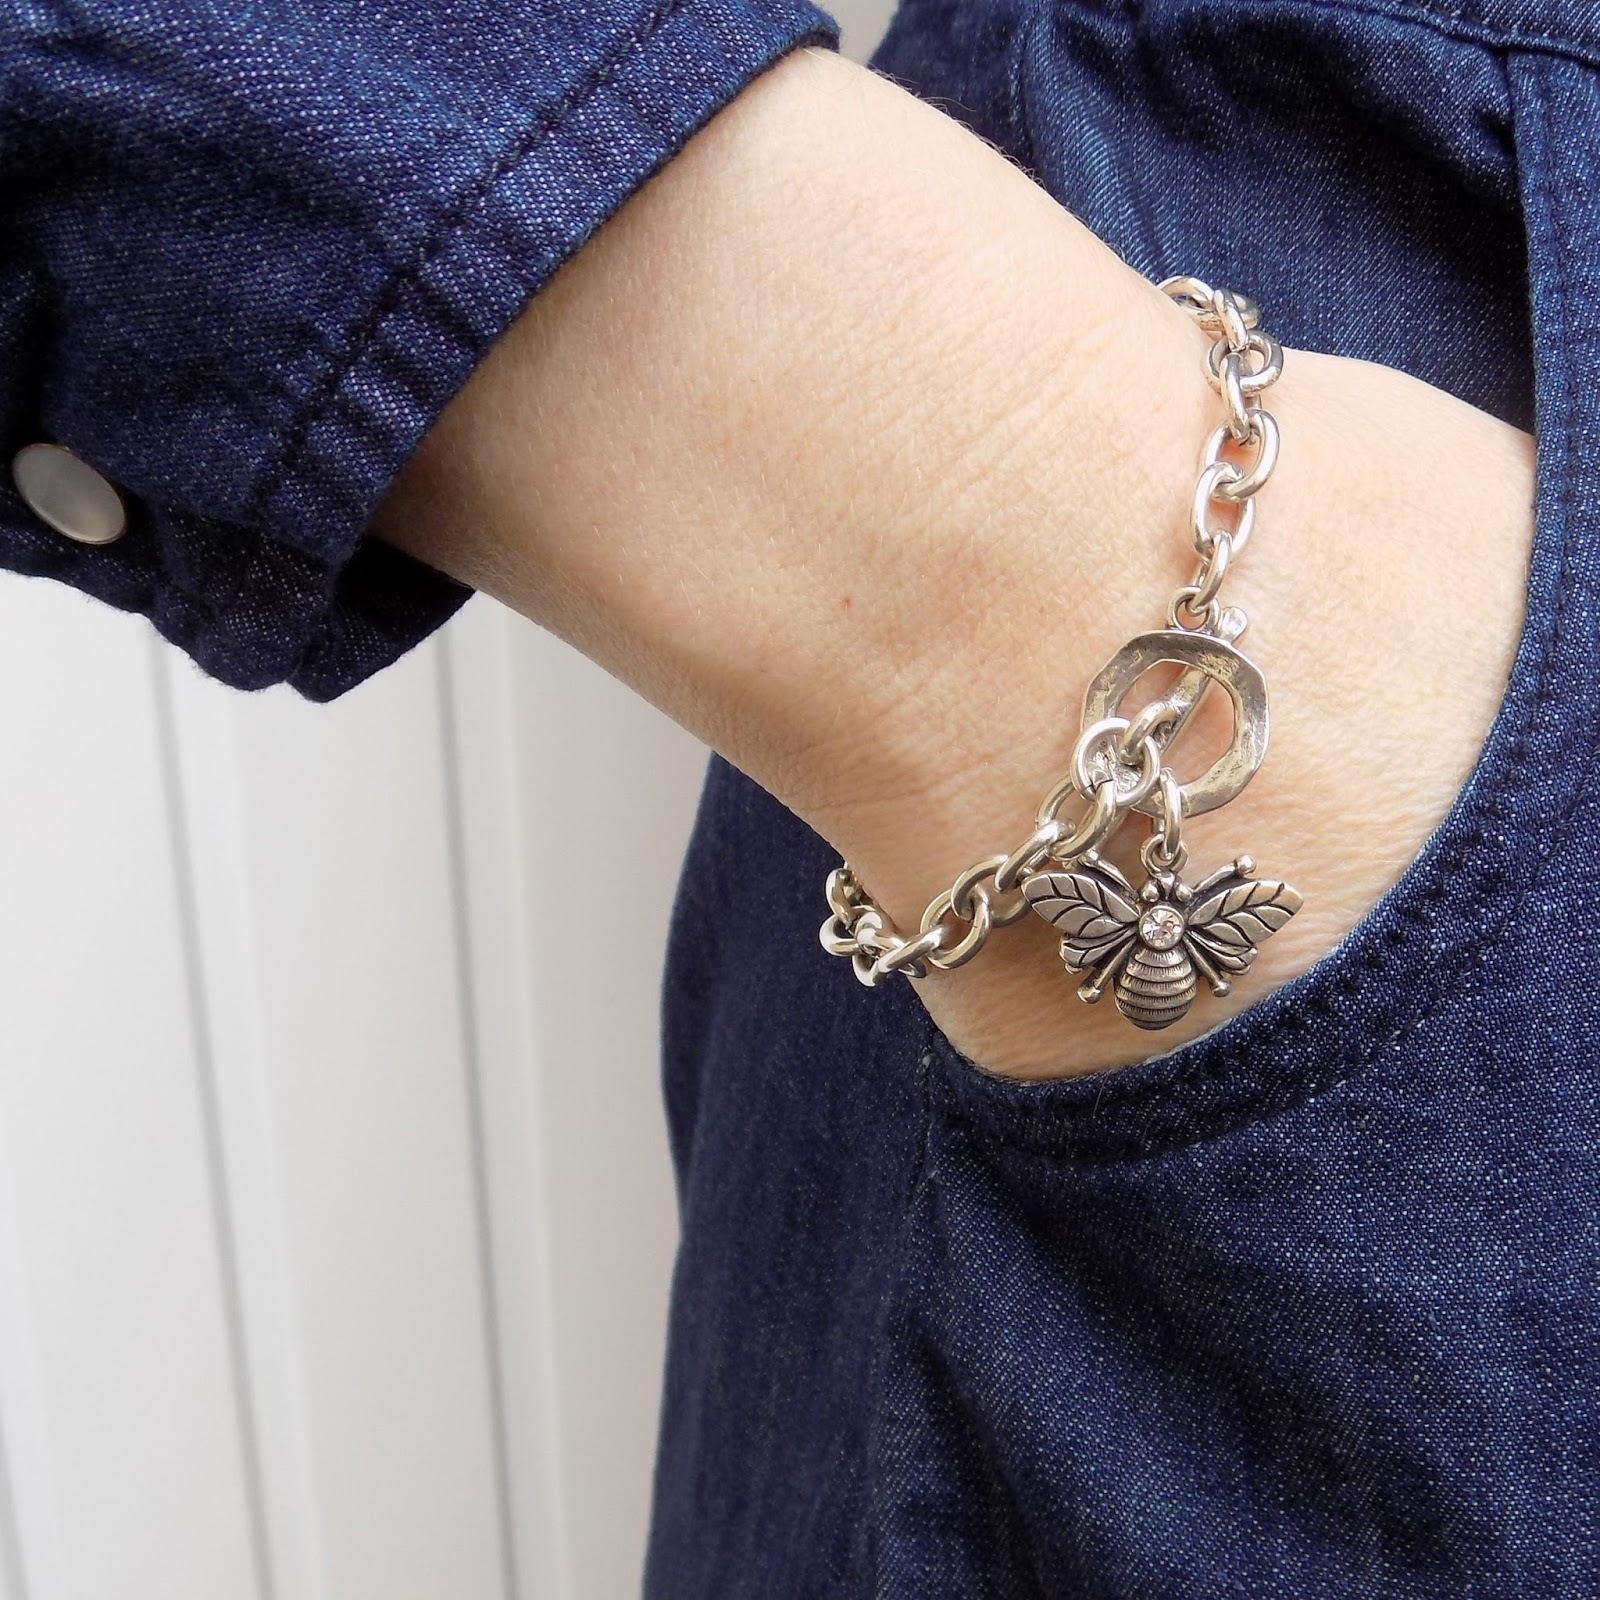 Danon swarovski bee necklace